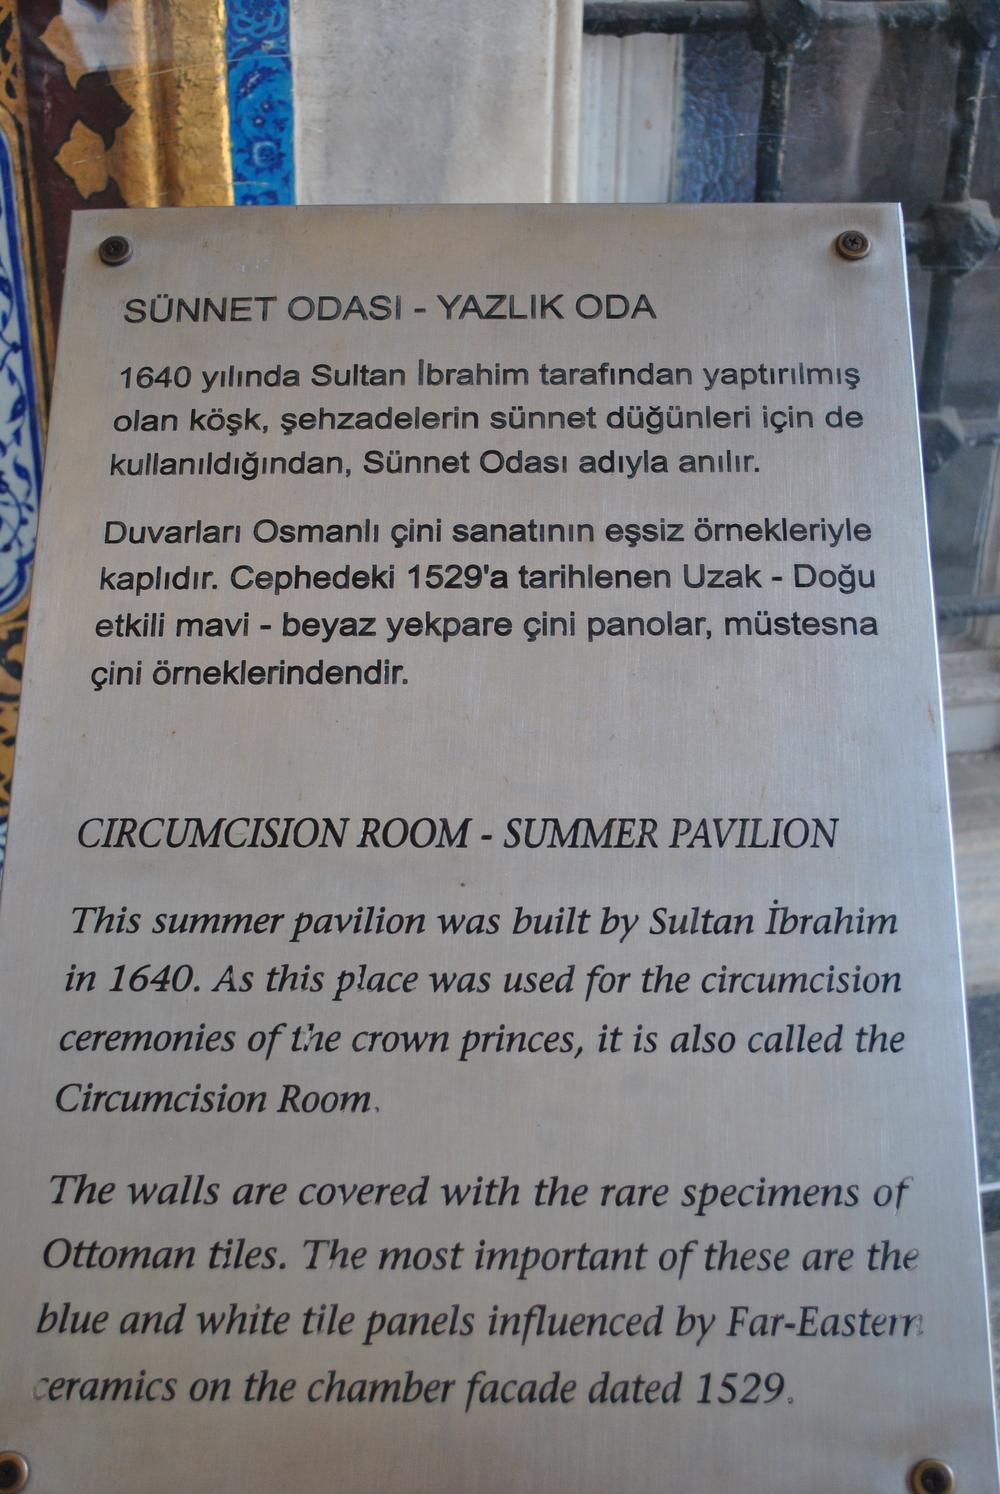 Circumcision Room (Sünnet Odası)